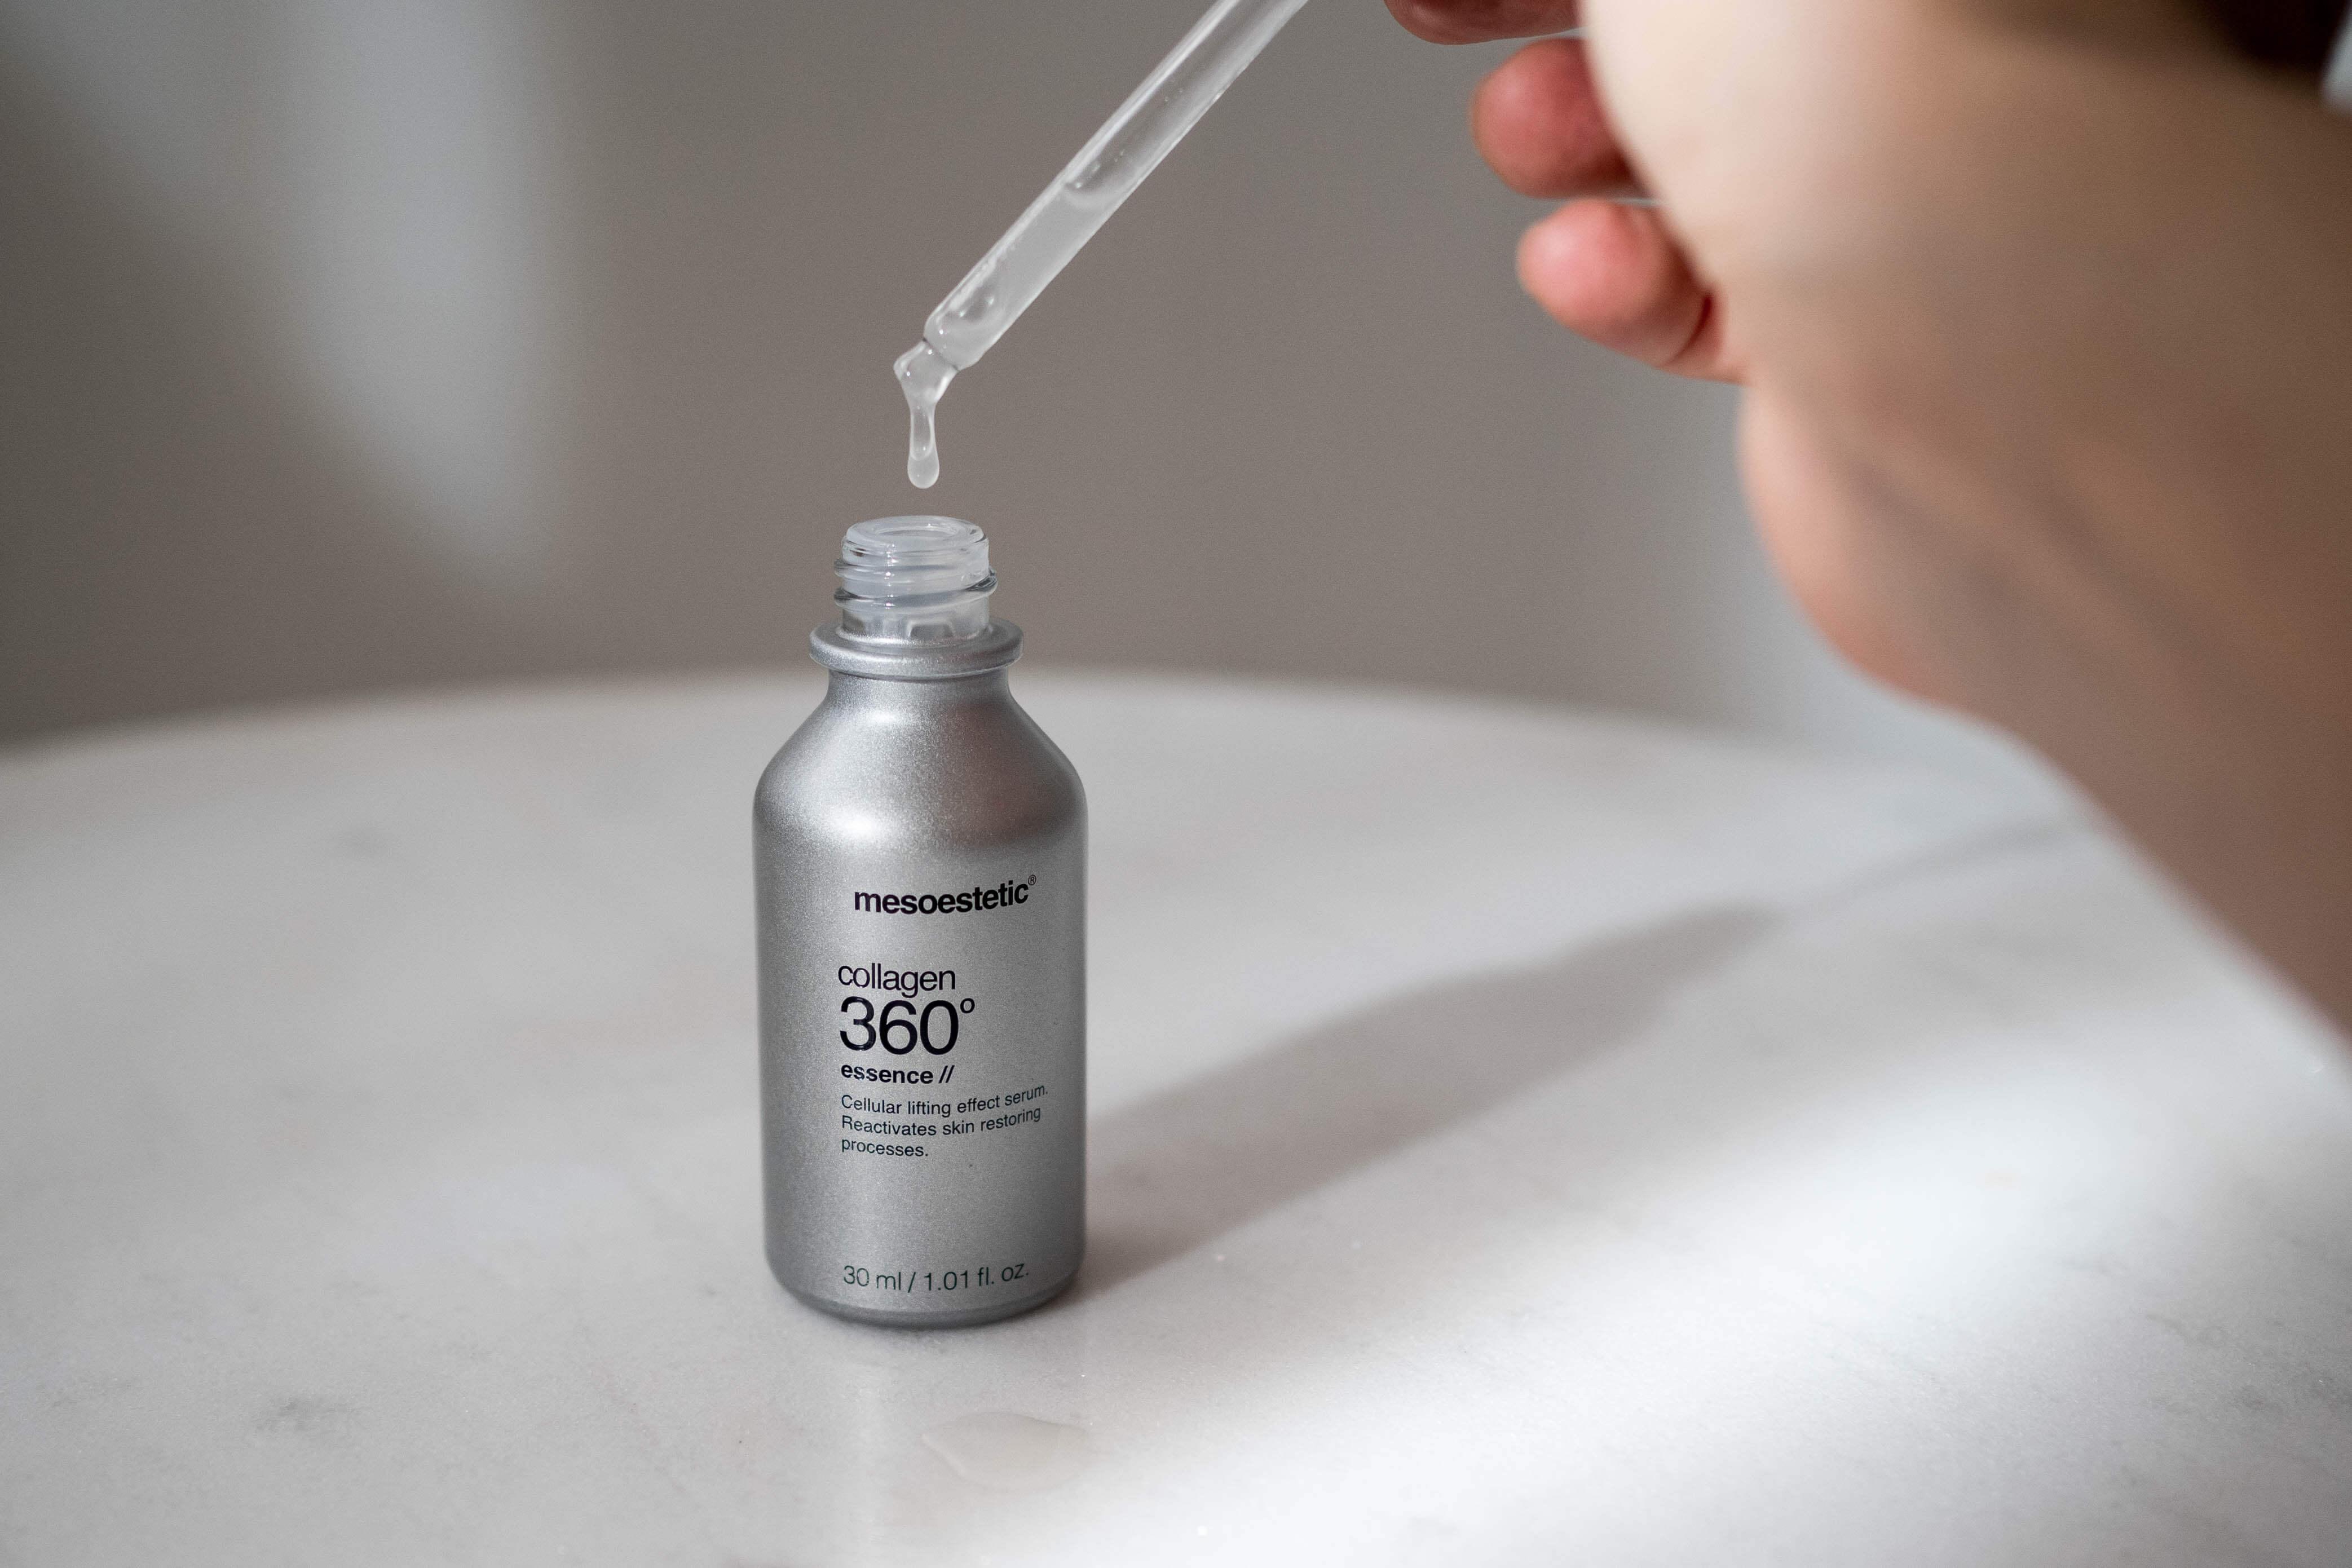 mesoestetic colagen 360 essence